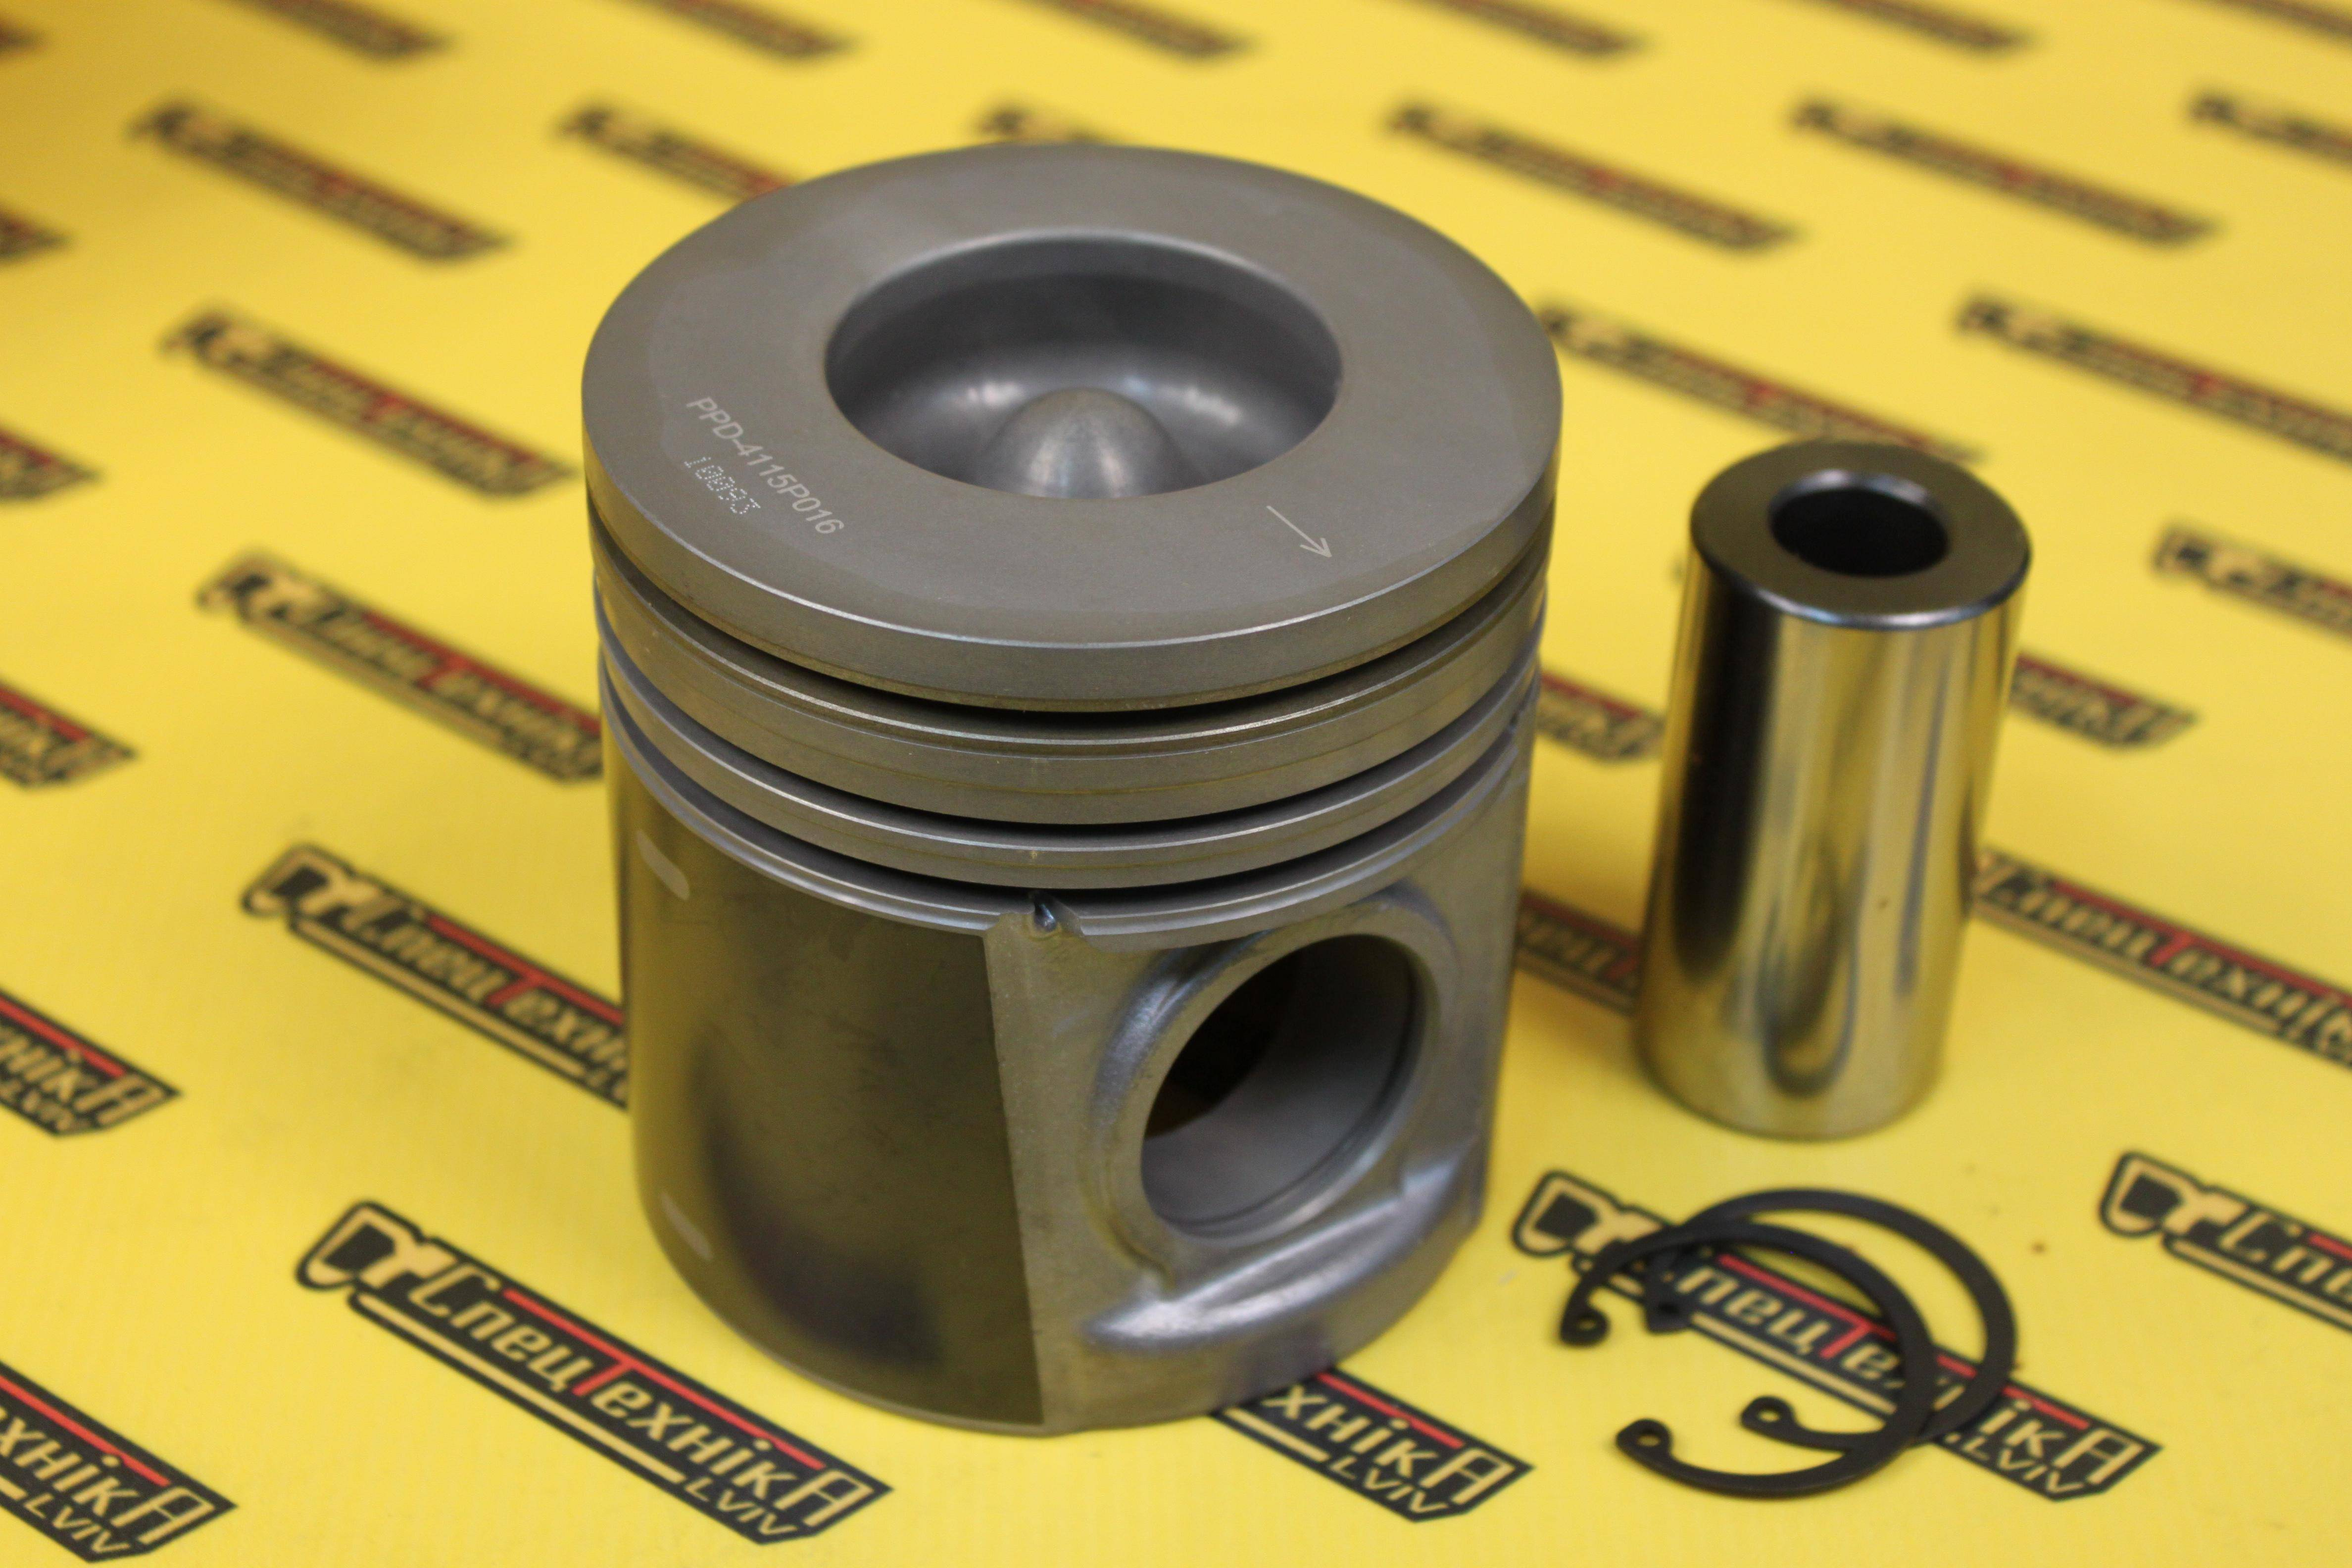 Поршень Perkins 105 мм +0.50 (al-fin) (4115P016)